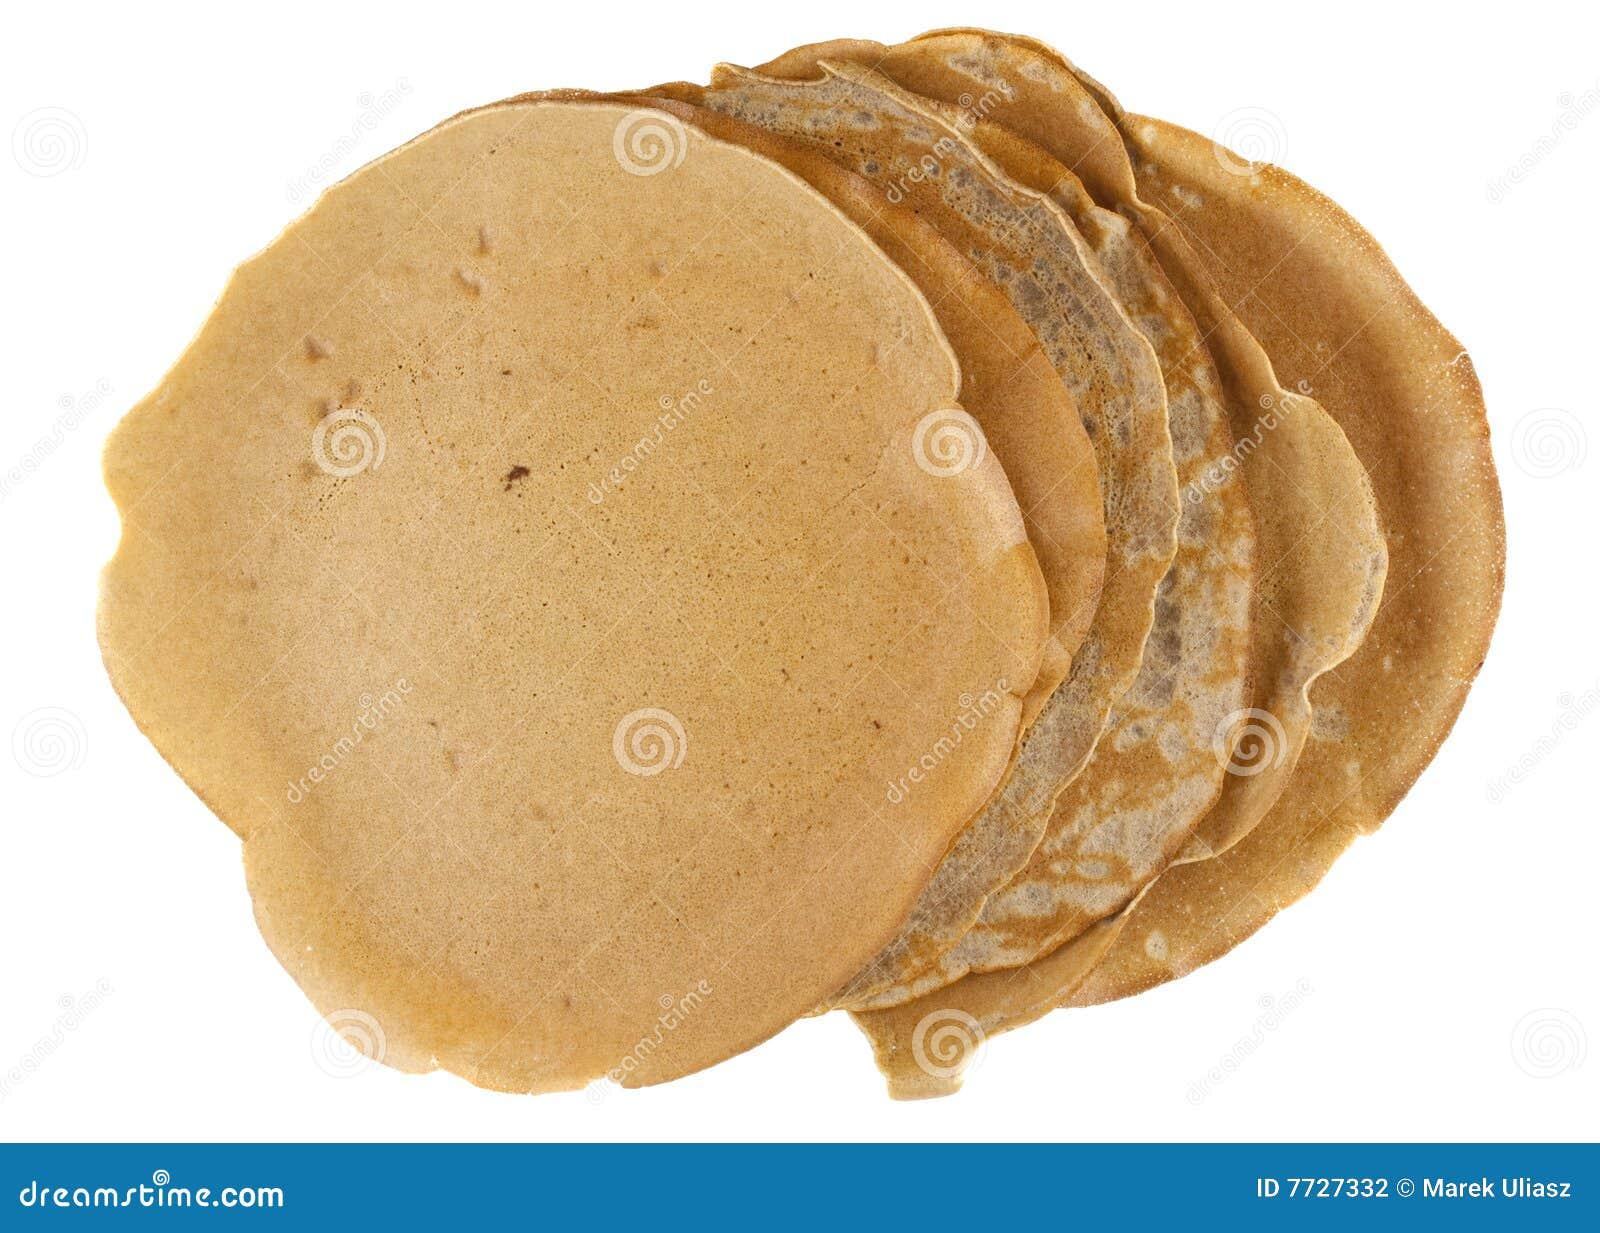 Homemade buckwheat flour crepes